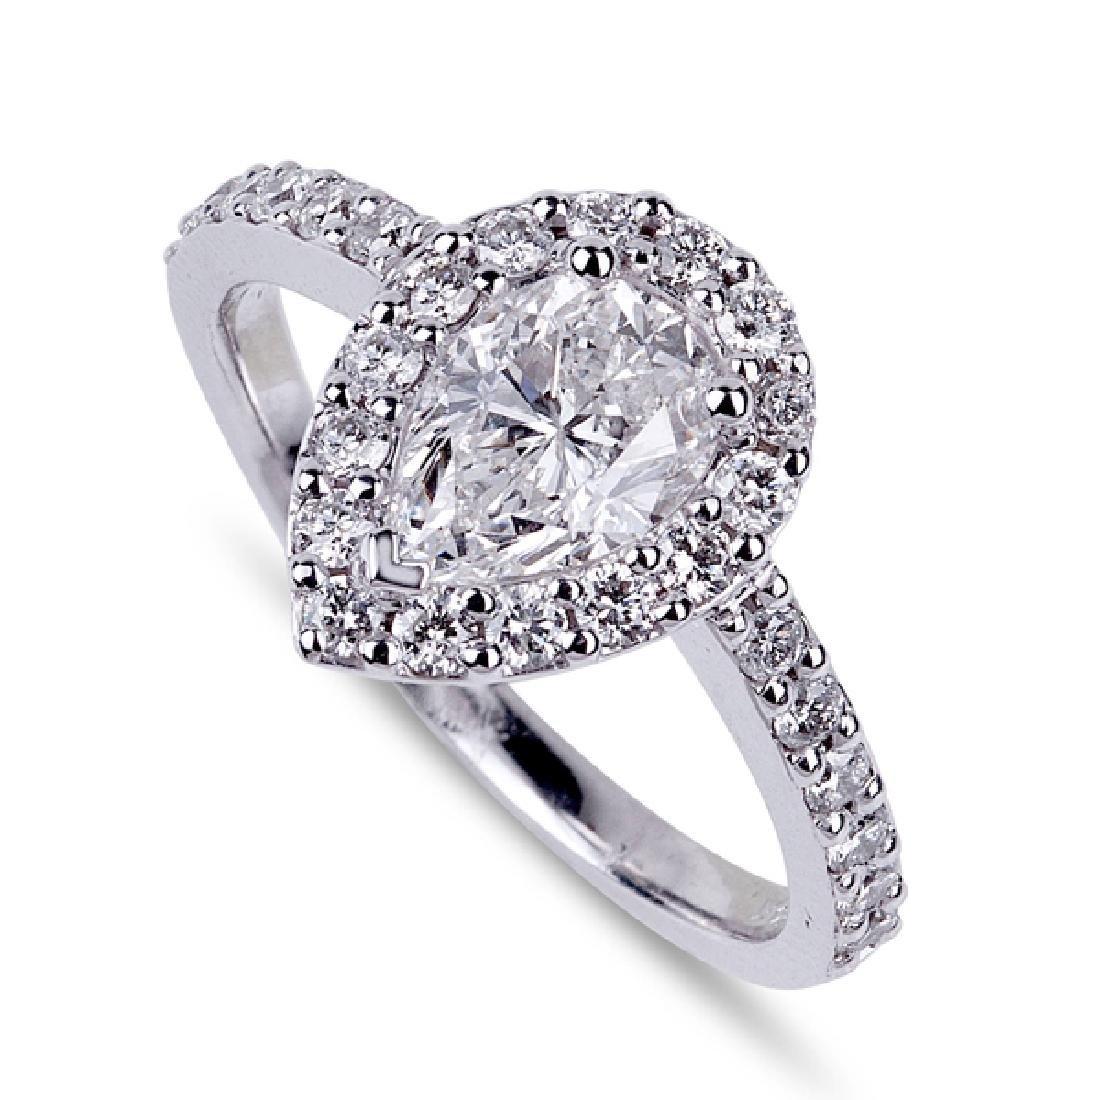 APP: 16k *14 kt. White Gold, 1.07CT Pear Cut Diamond